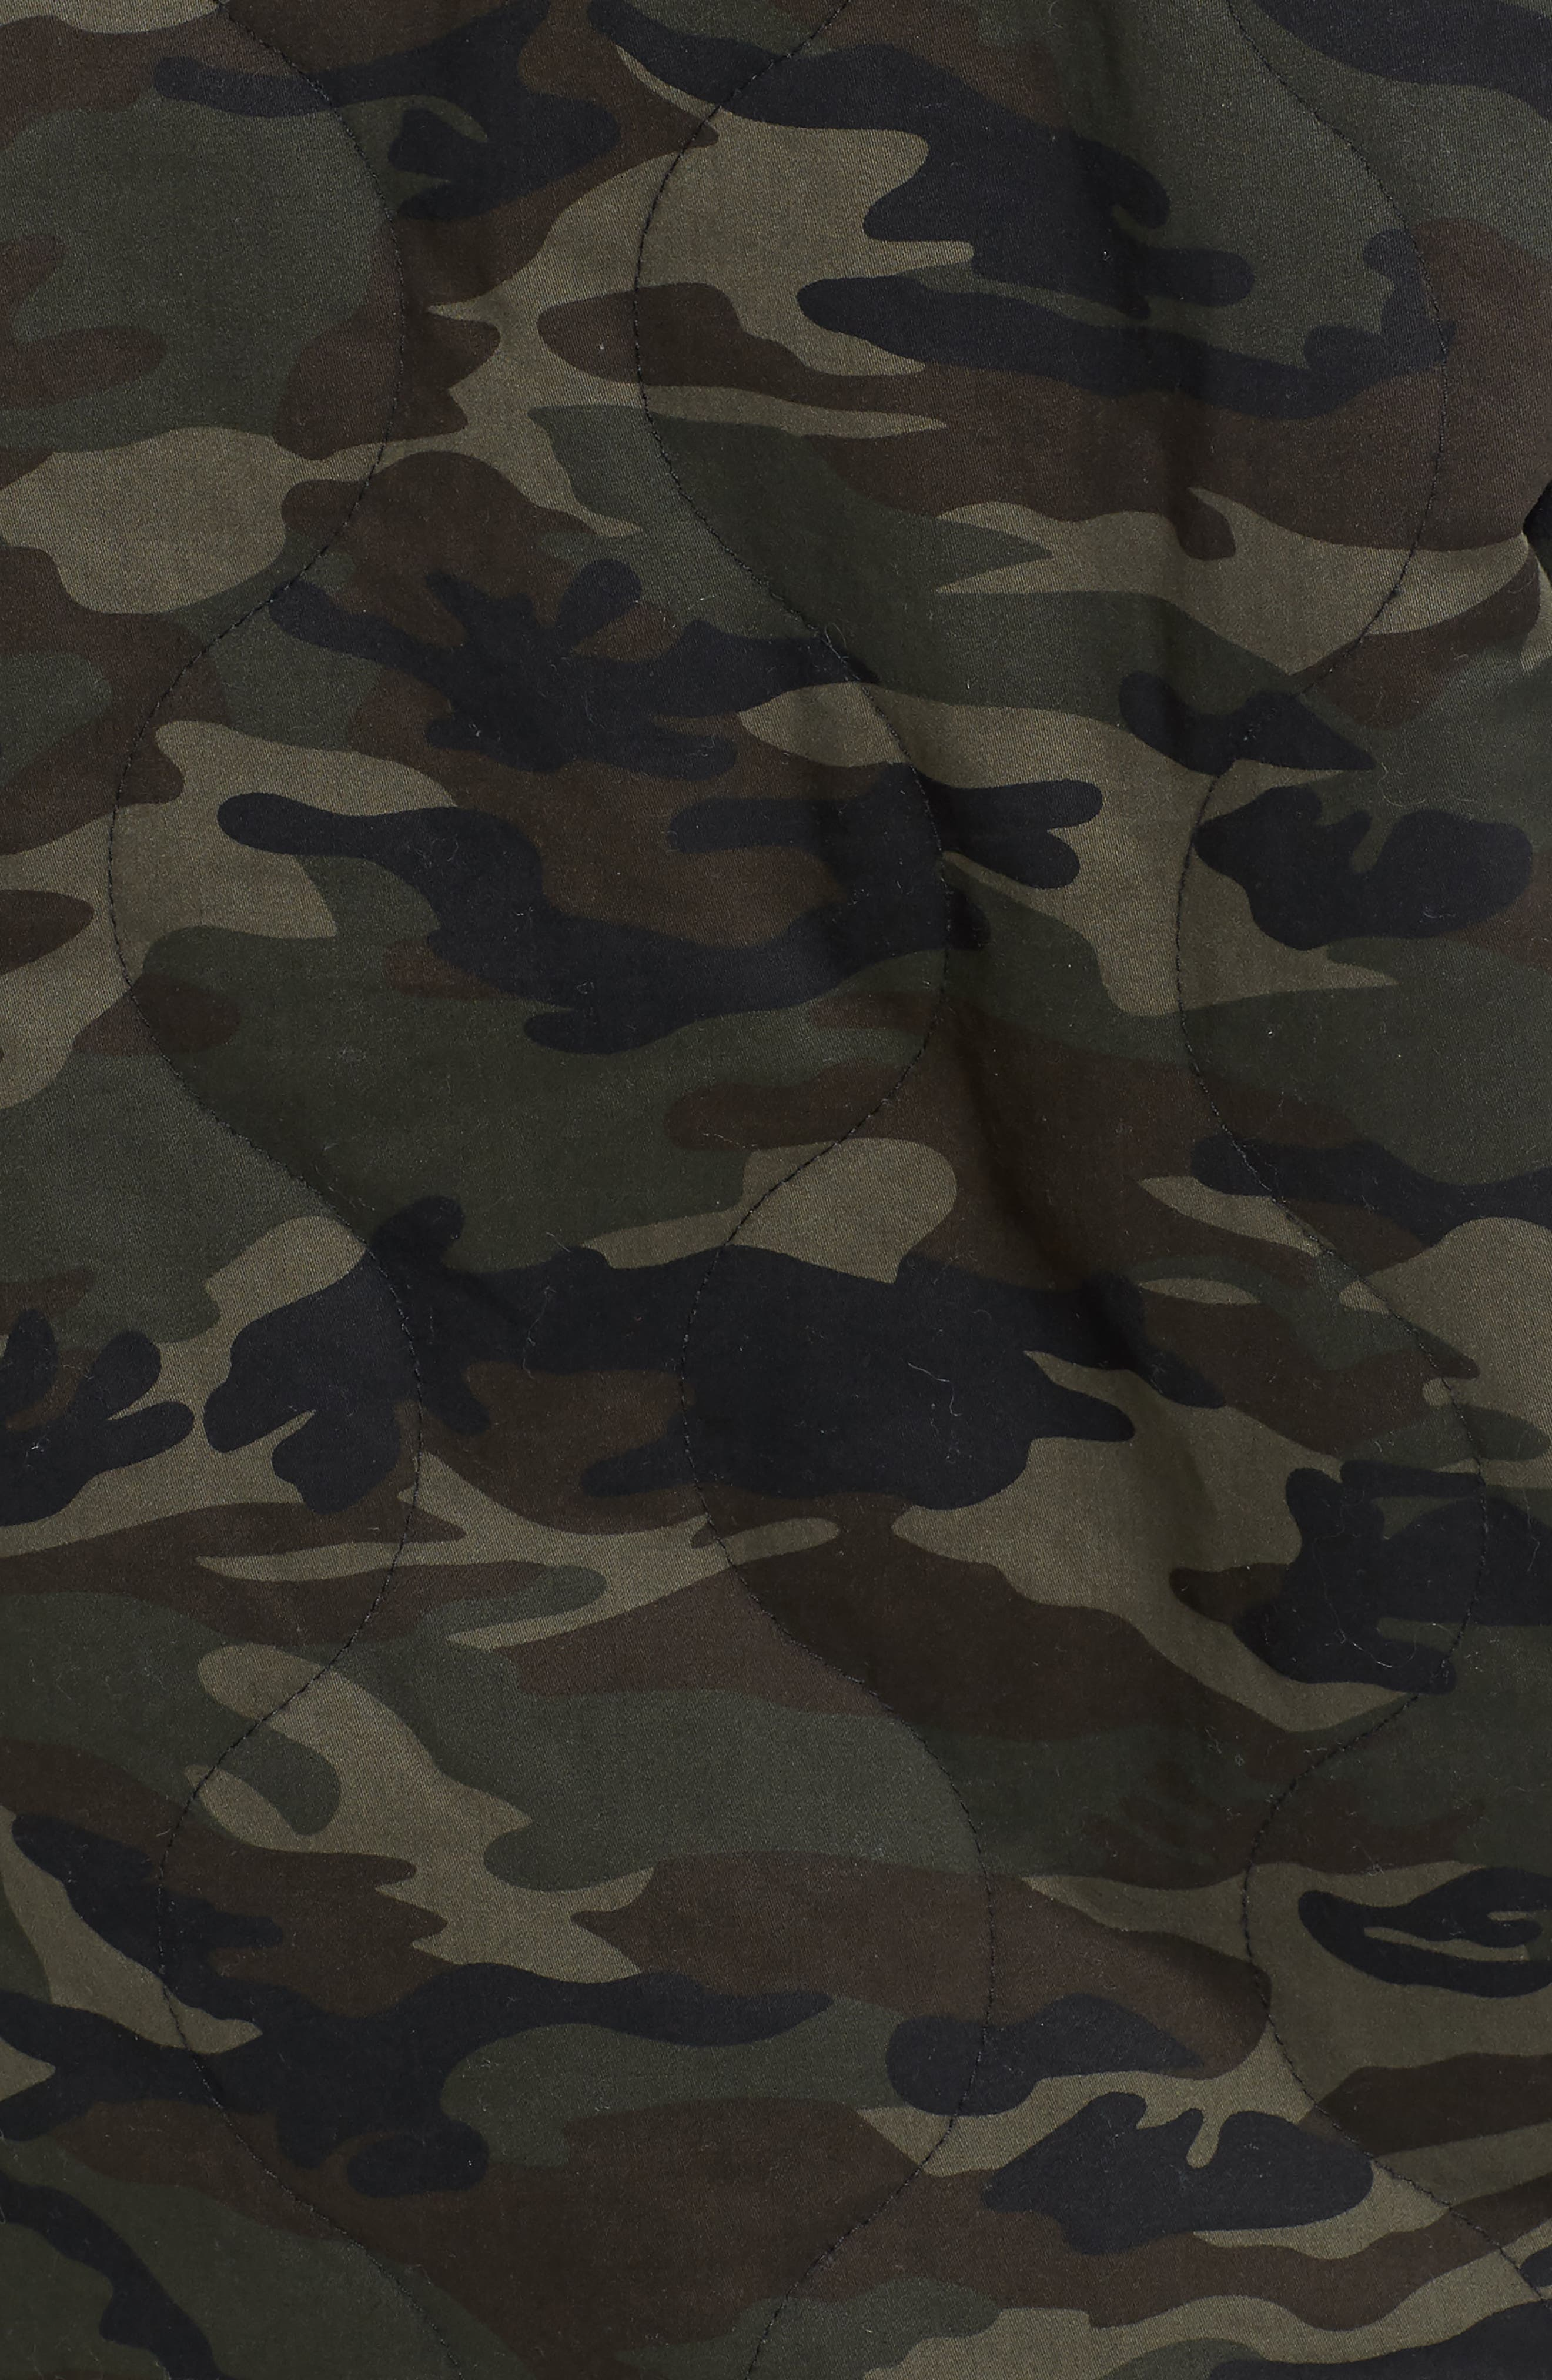 Reversible Camo Jacket,                             Alternate thumbnail 5, color,                             Camo